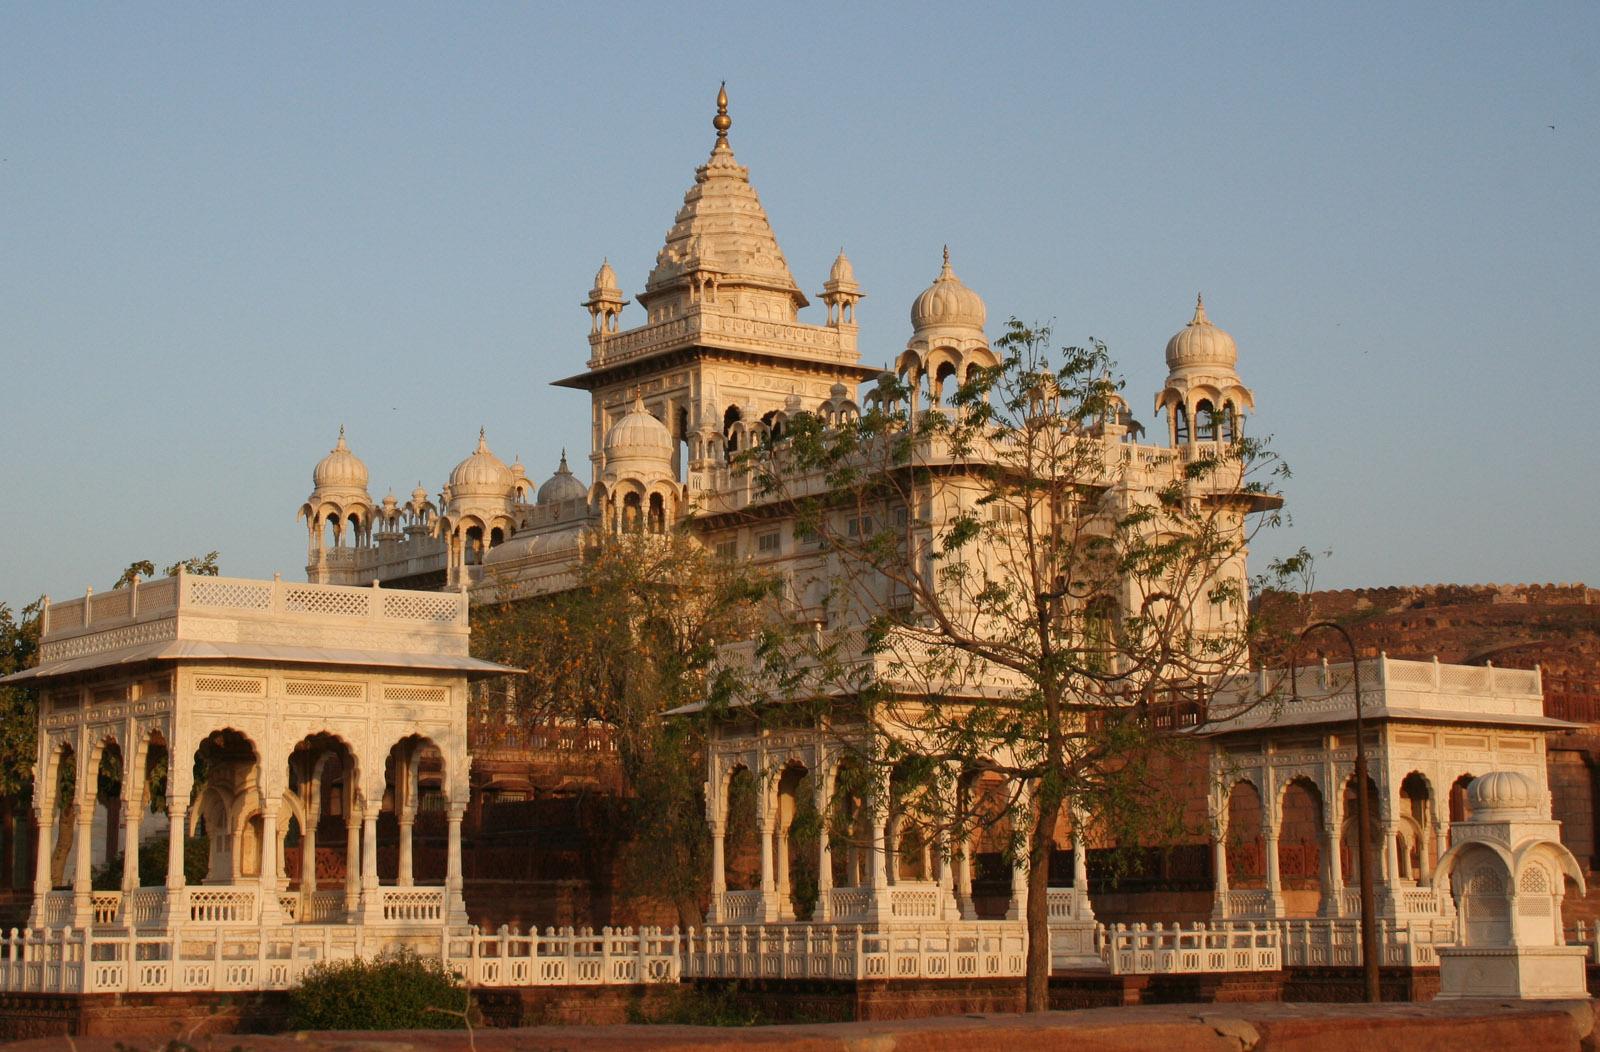 The Jaswant Thada mausoleum